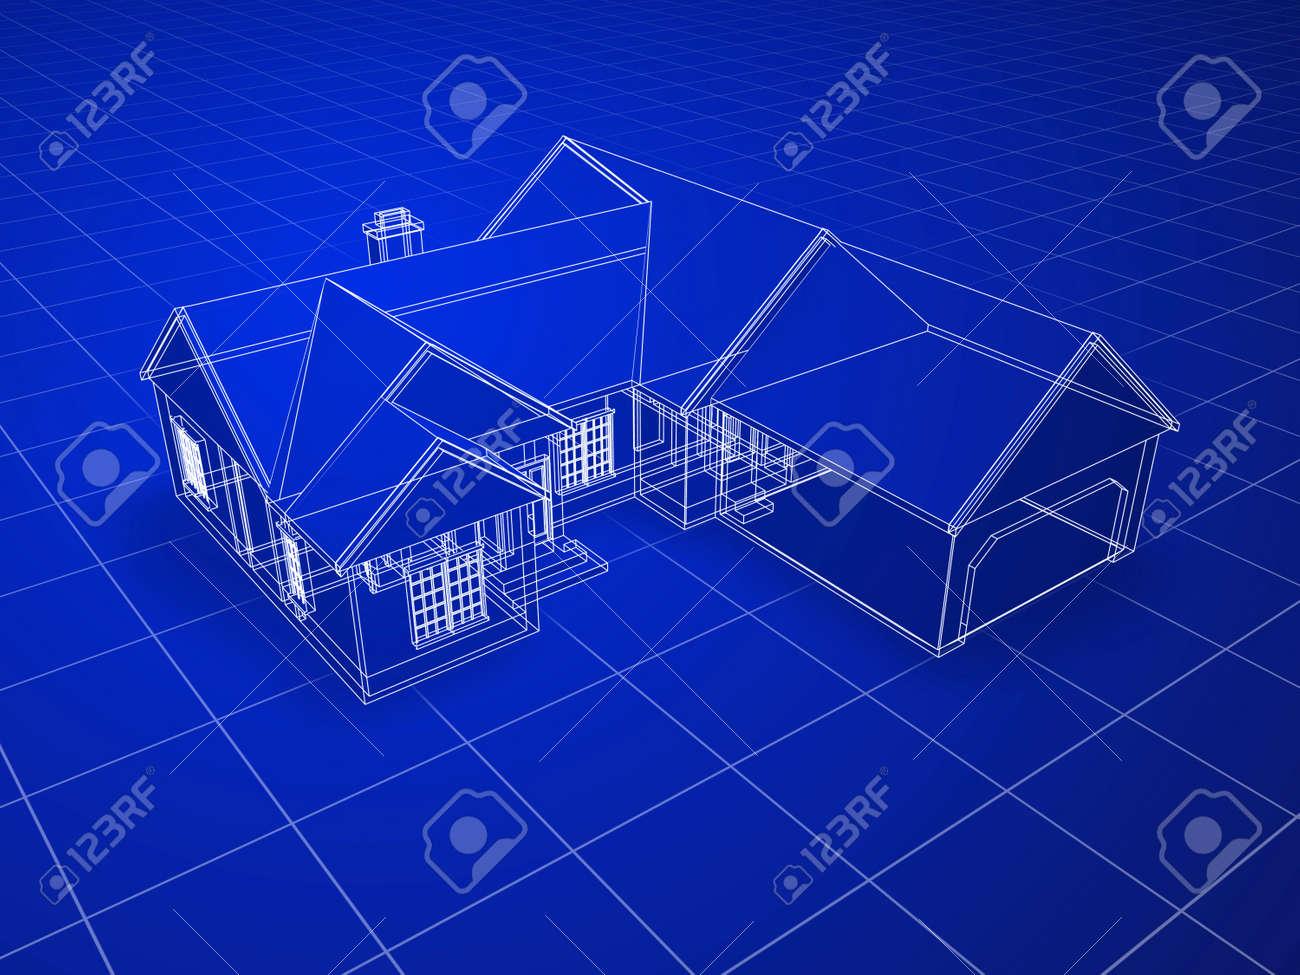 Blueprint style 3d rendered house white outlines on blue blueprint style 3d rendered house white outlines on blue background stock photo 14637119 malvernweather Images